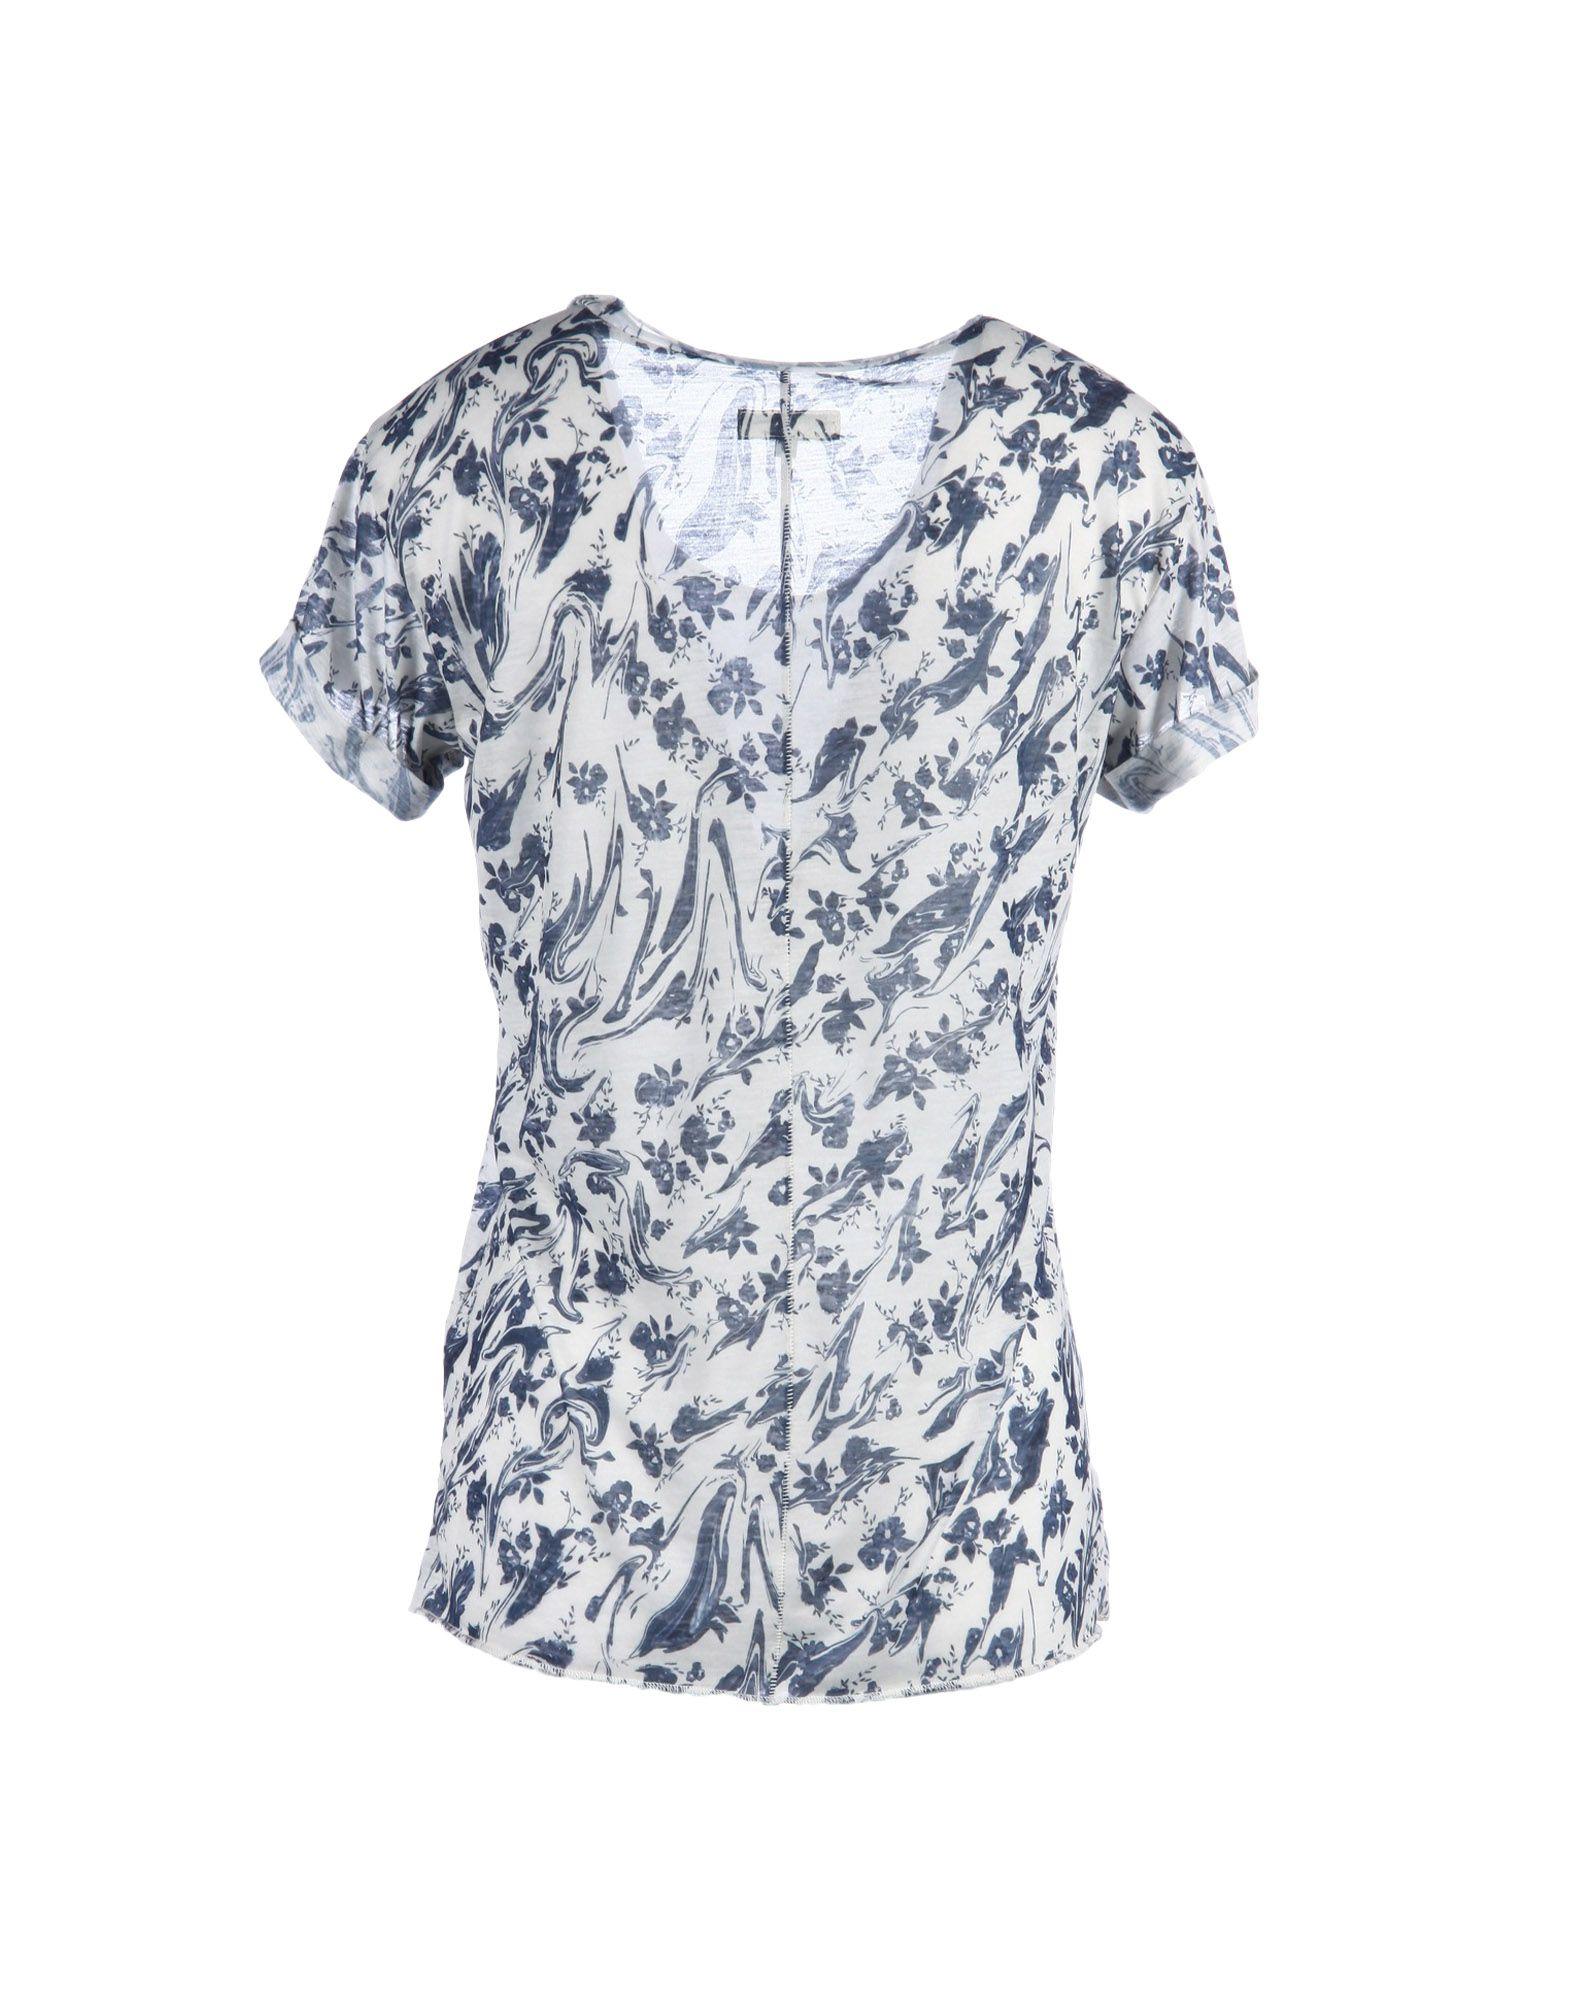 Lyst rag bone t shirt in blue for Rag and bone t shirts